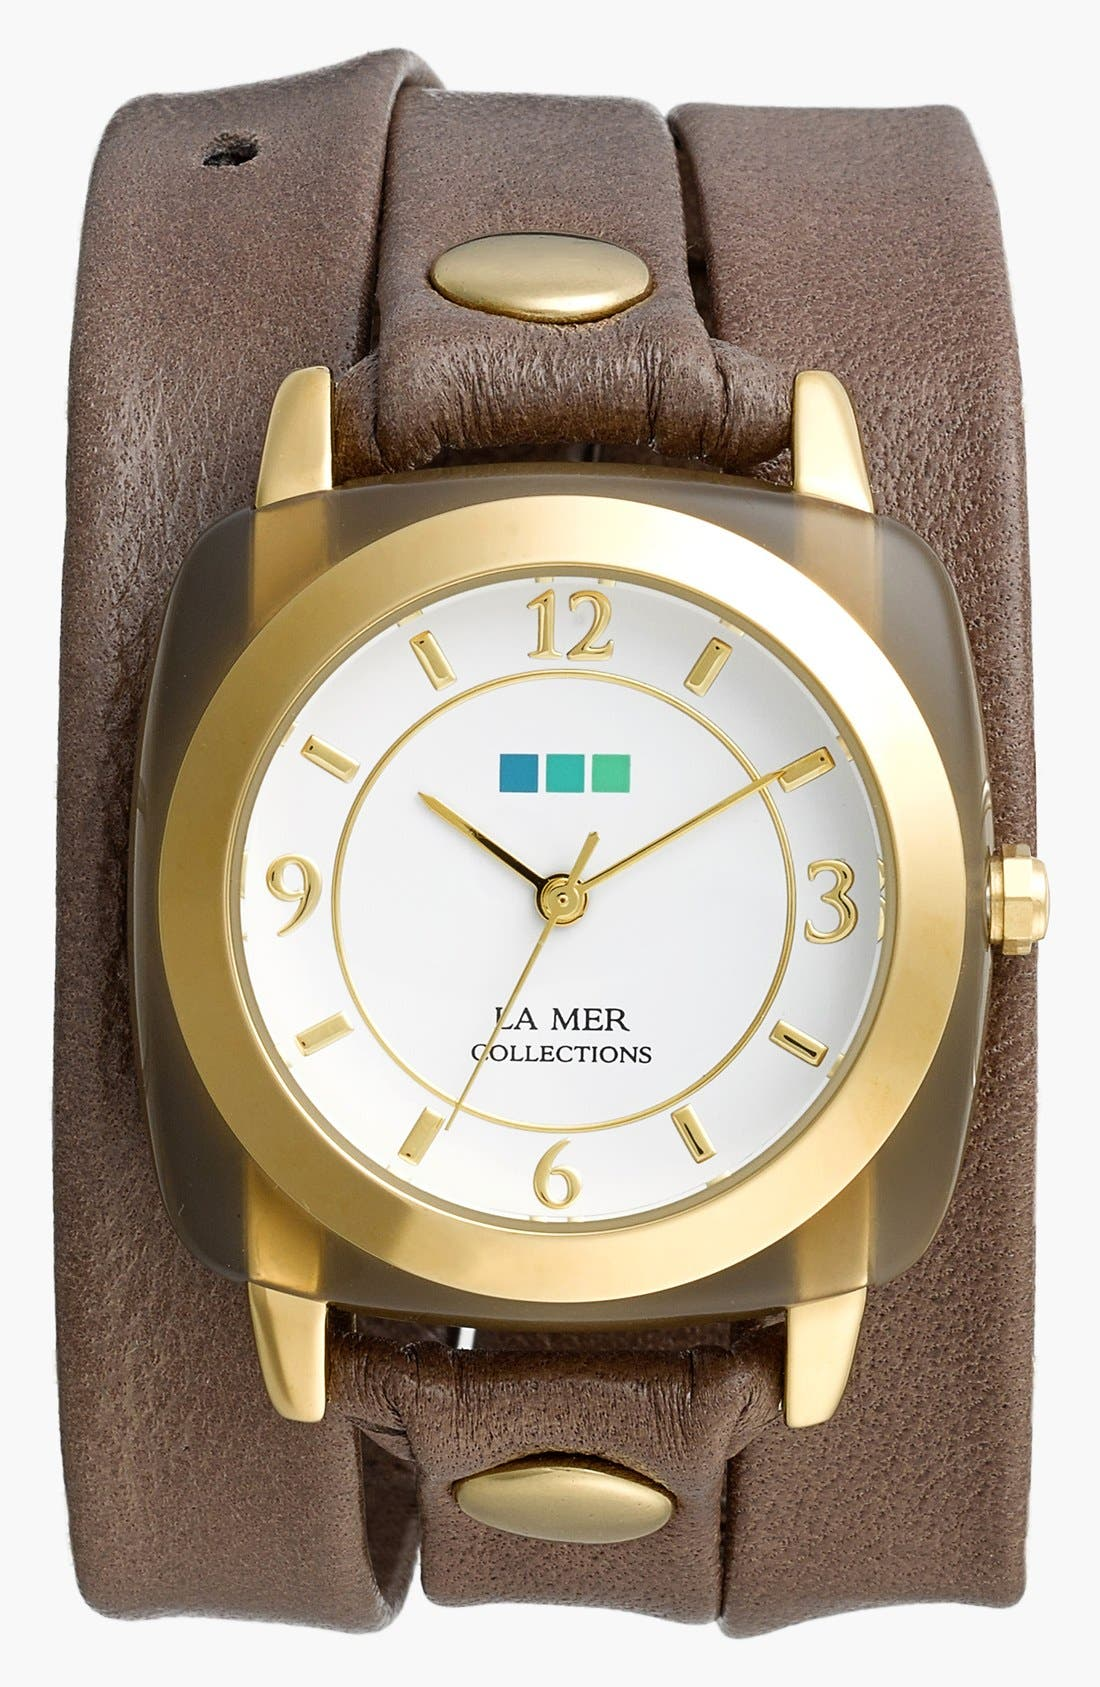 Main Image - La Mer Collections 'Smokey Quartz' Leather Wrap Bracelet Watch, 42mm x 40mm